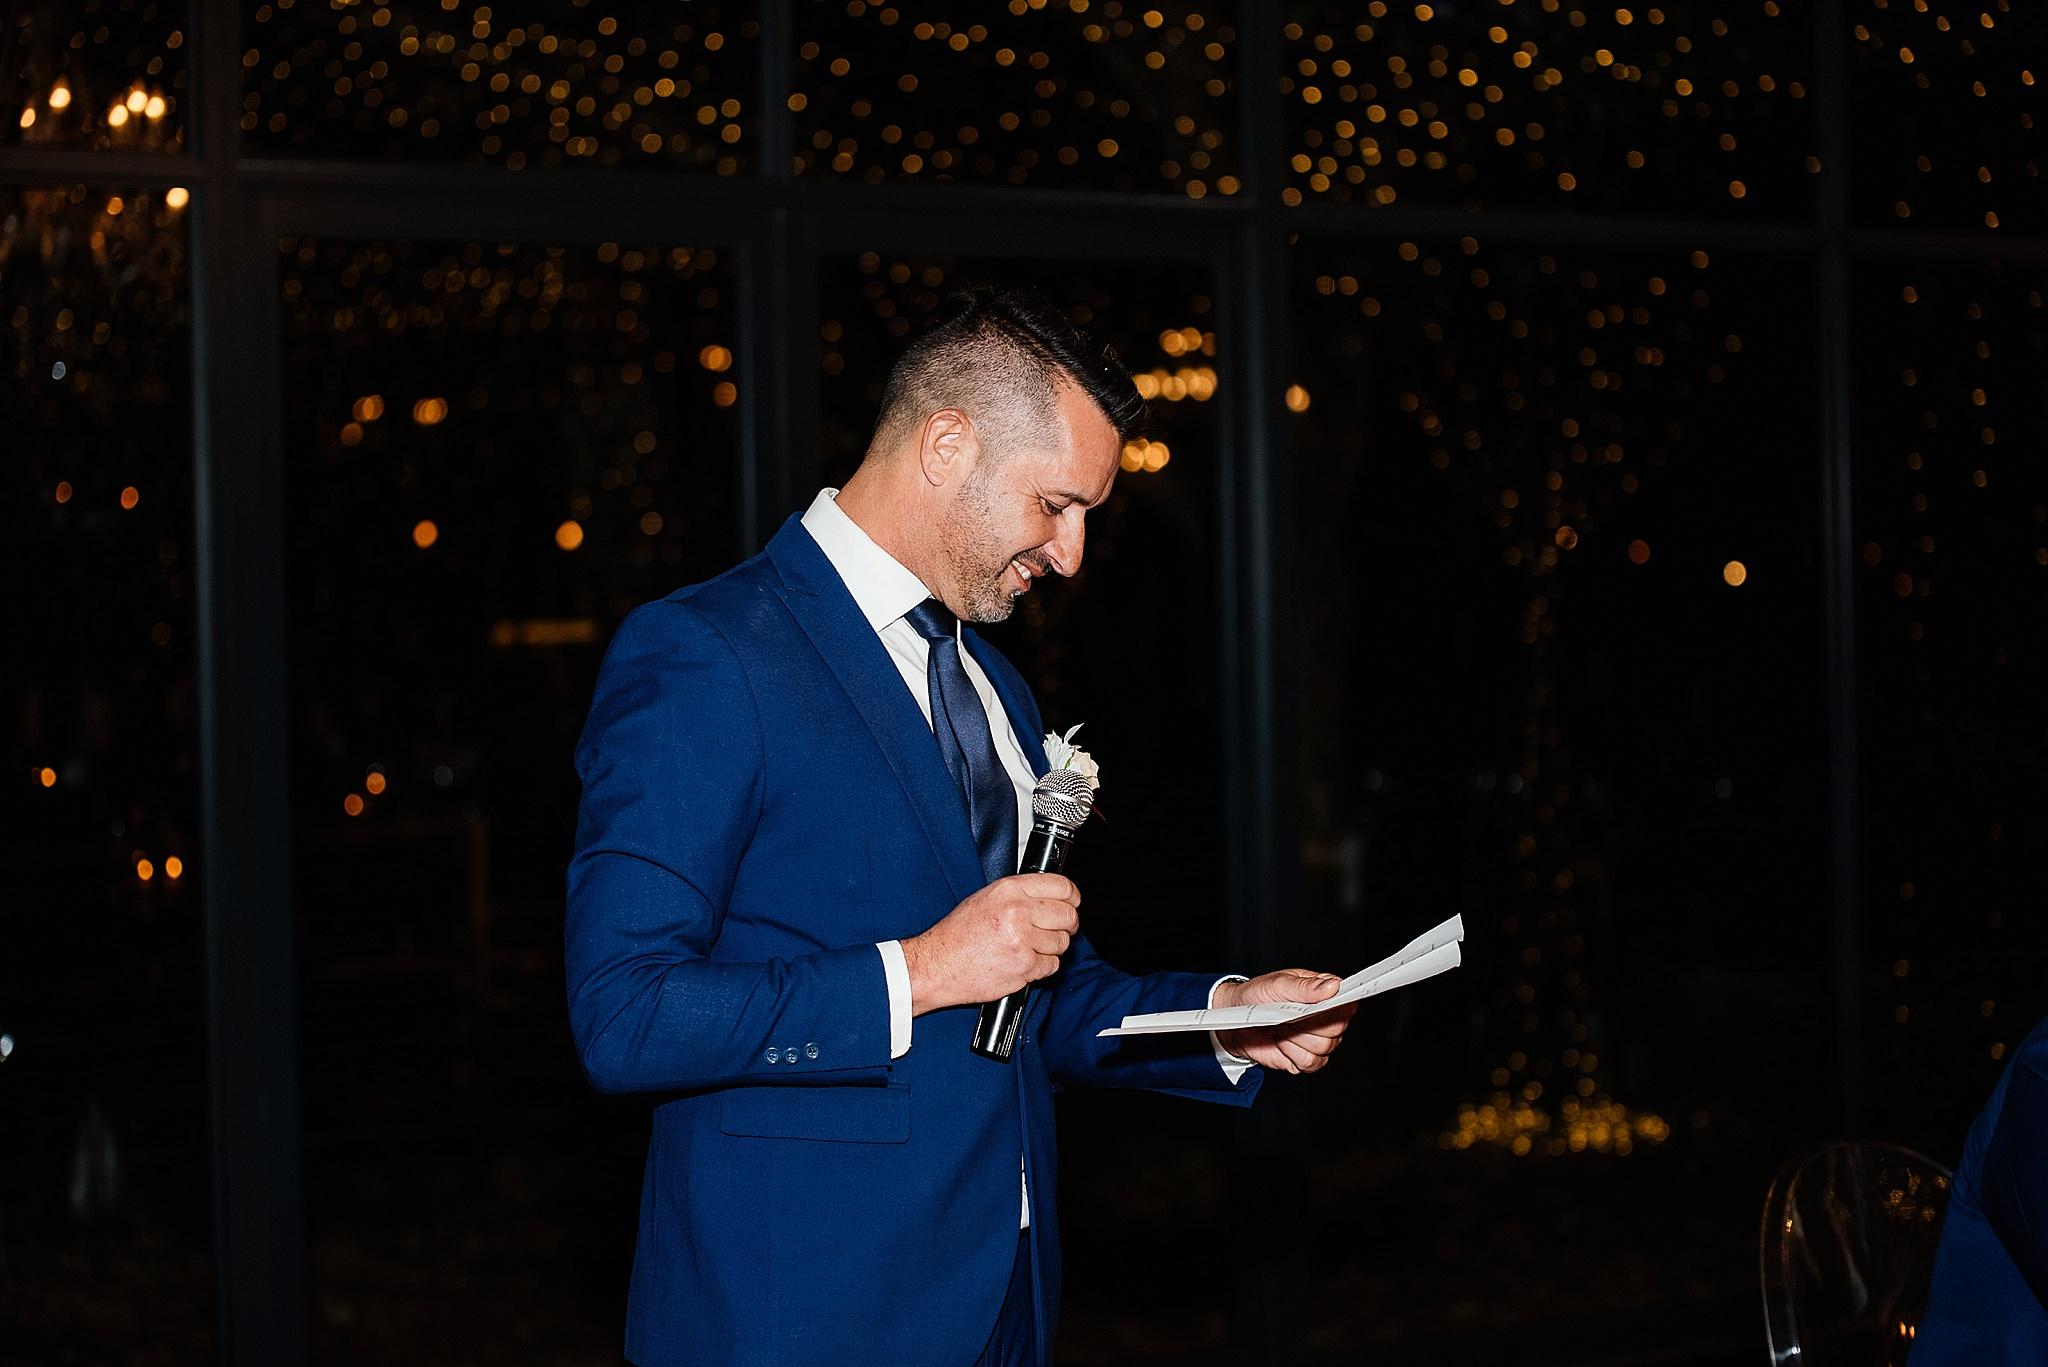 Cape Town Photographer Darren Bester - Die Woud Wedding - Gareth & Roxanne_0047.jpg